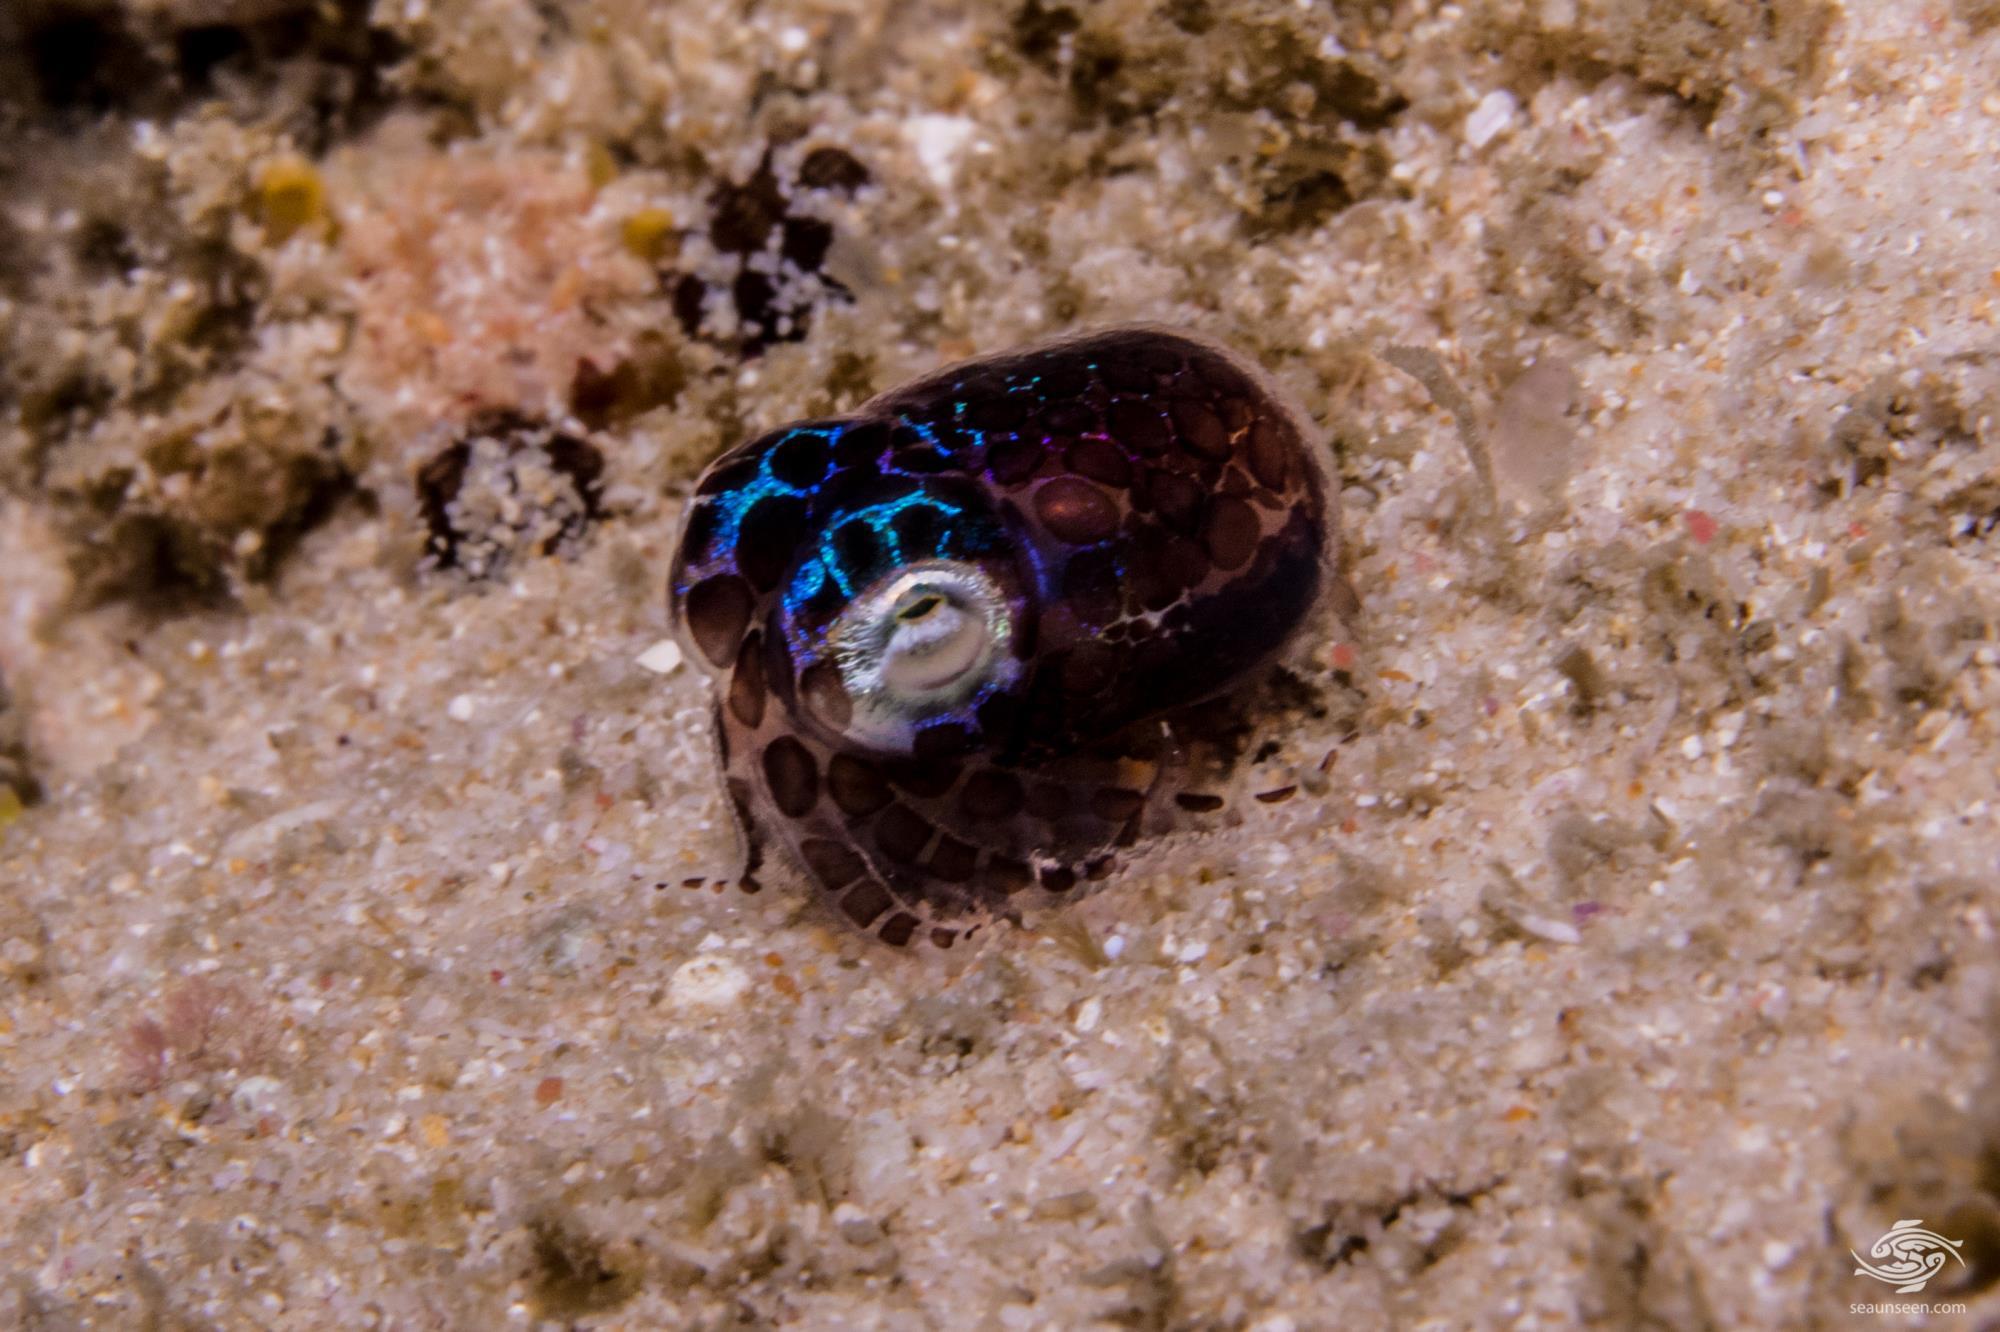 Bobtail squid also known as Pigmy Squid